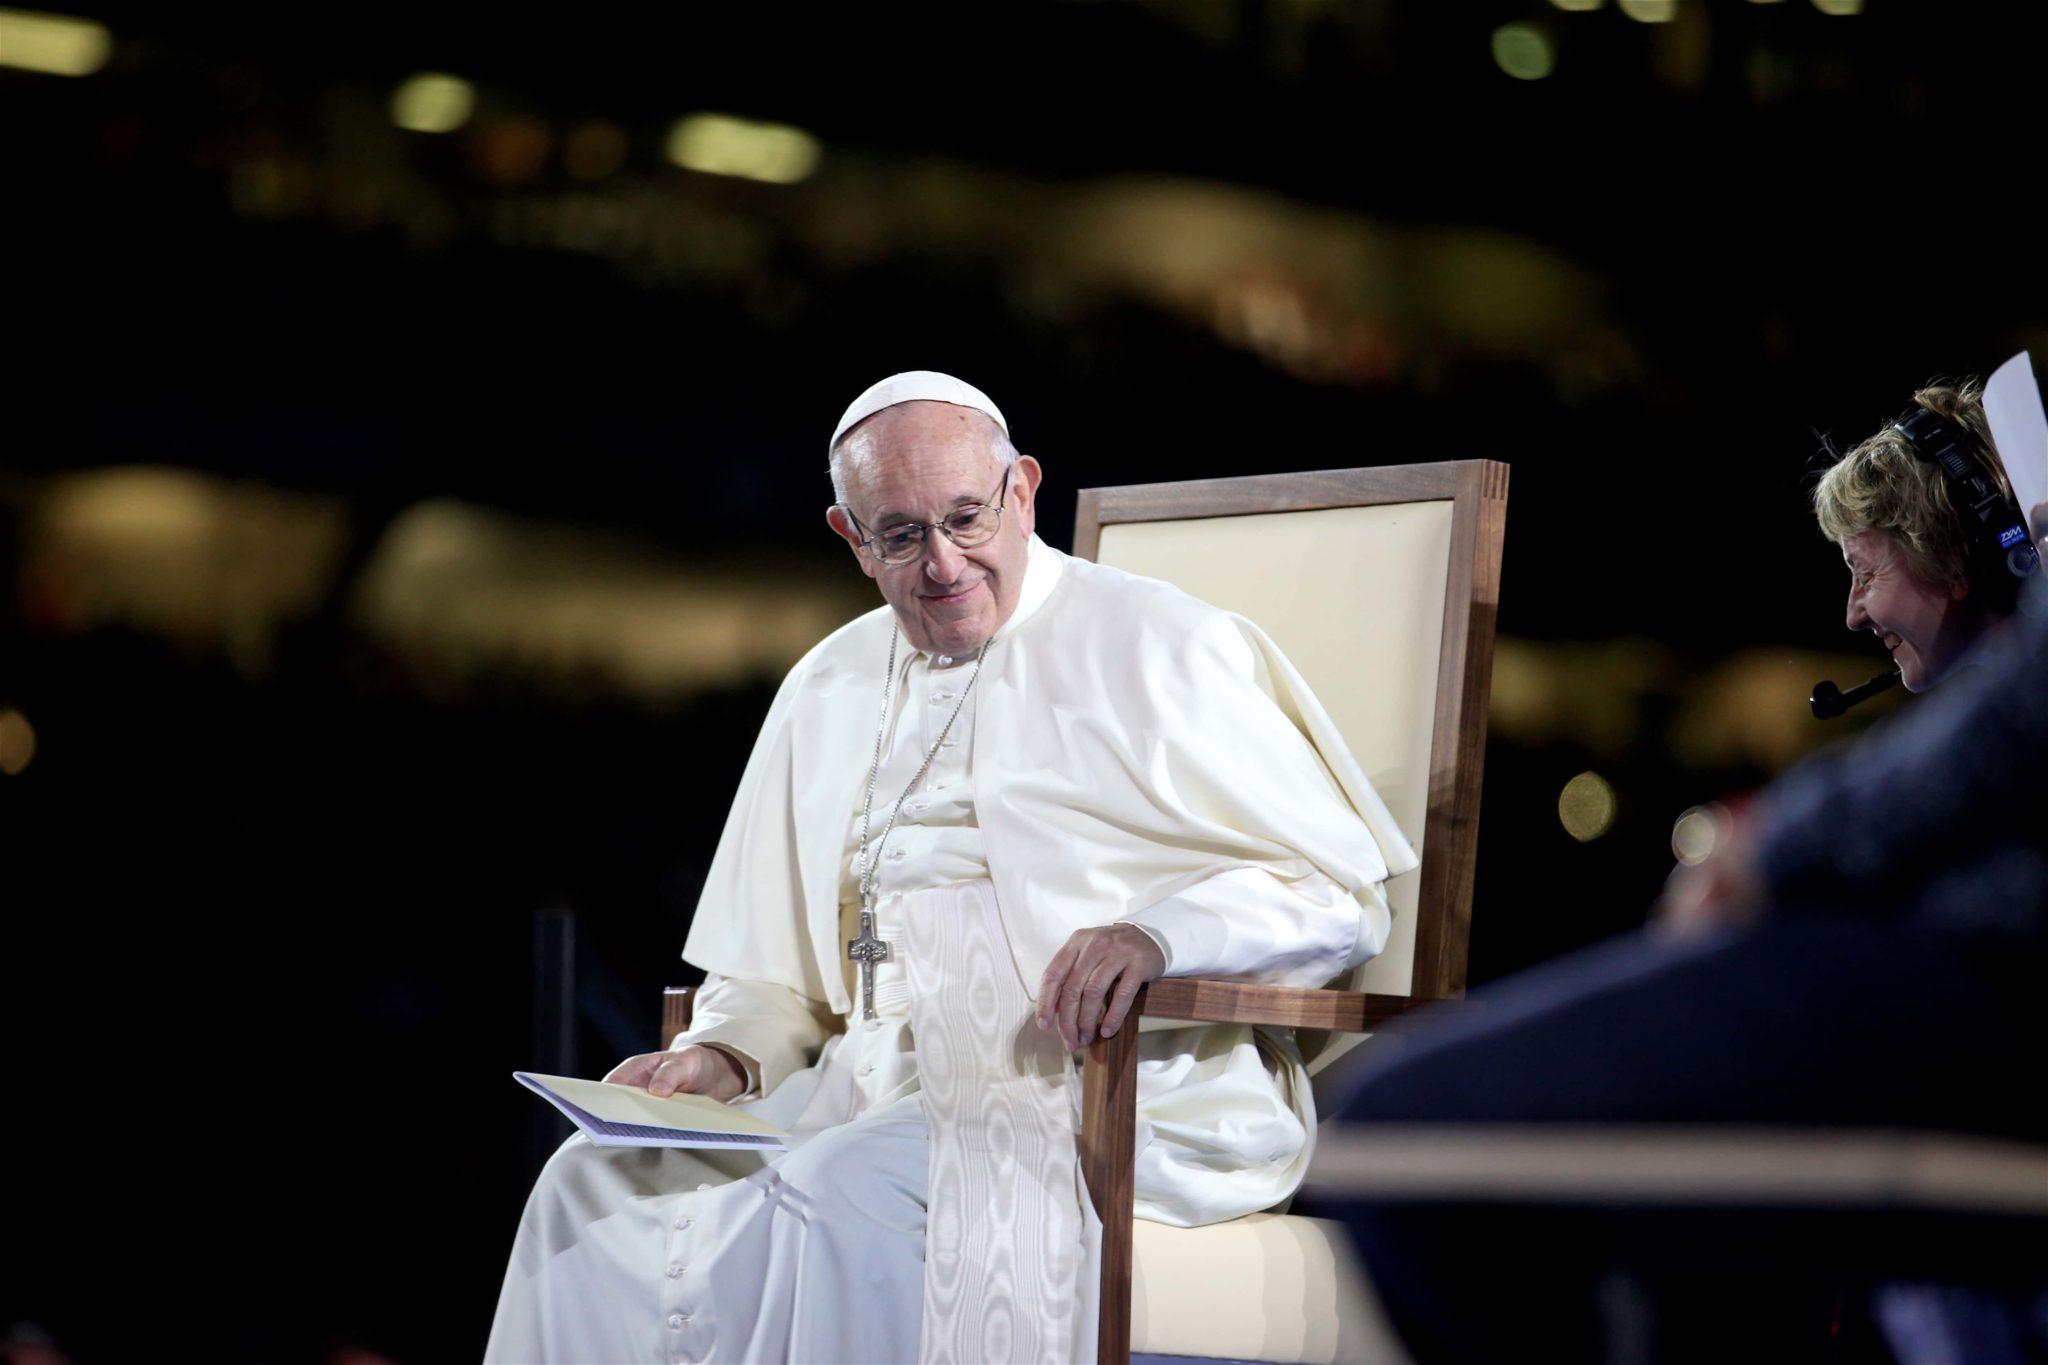 Pope Francis at Croke Park